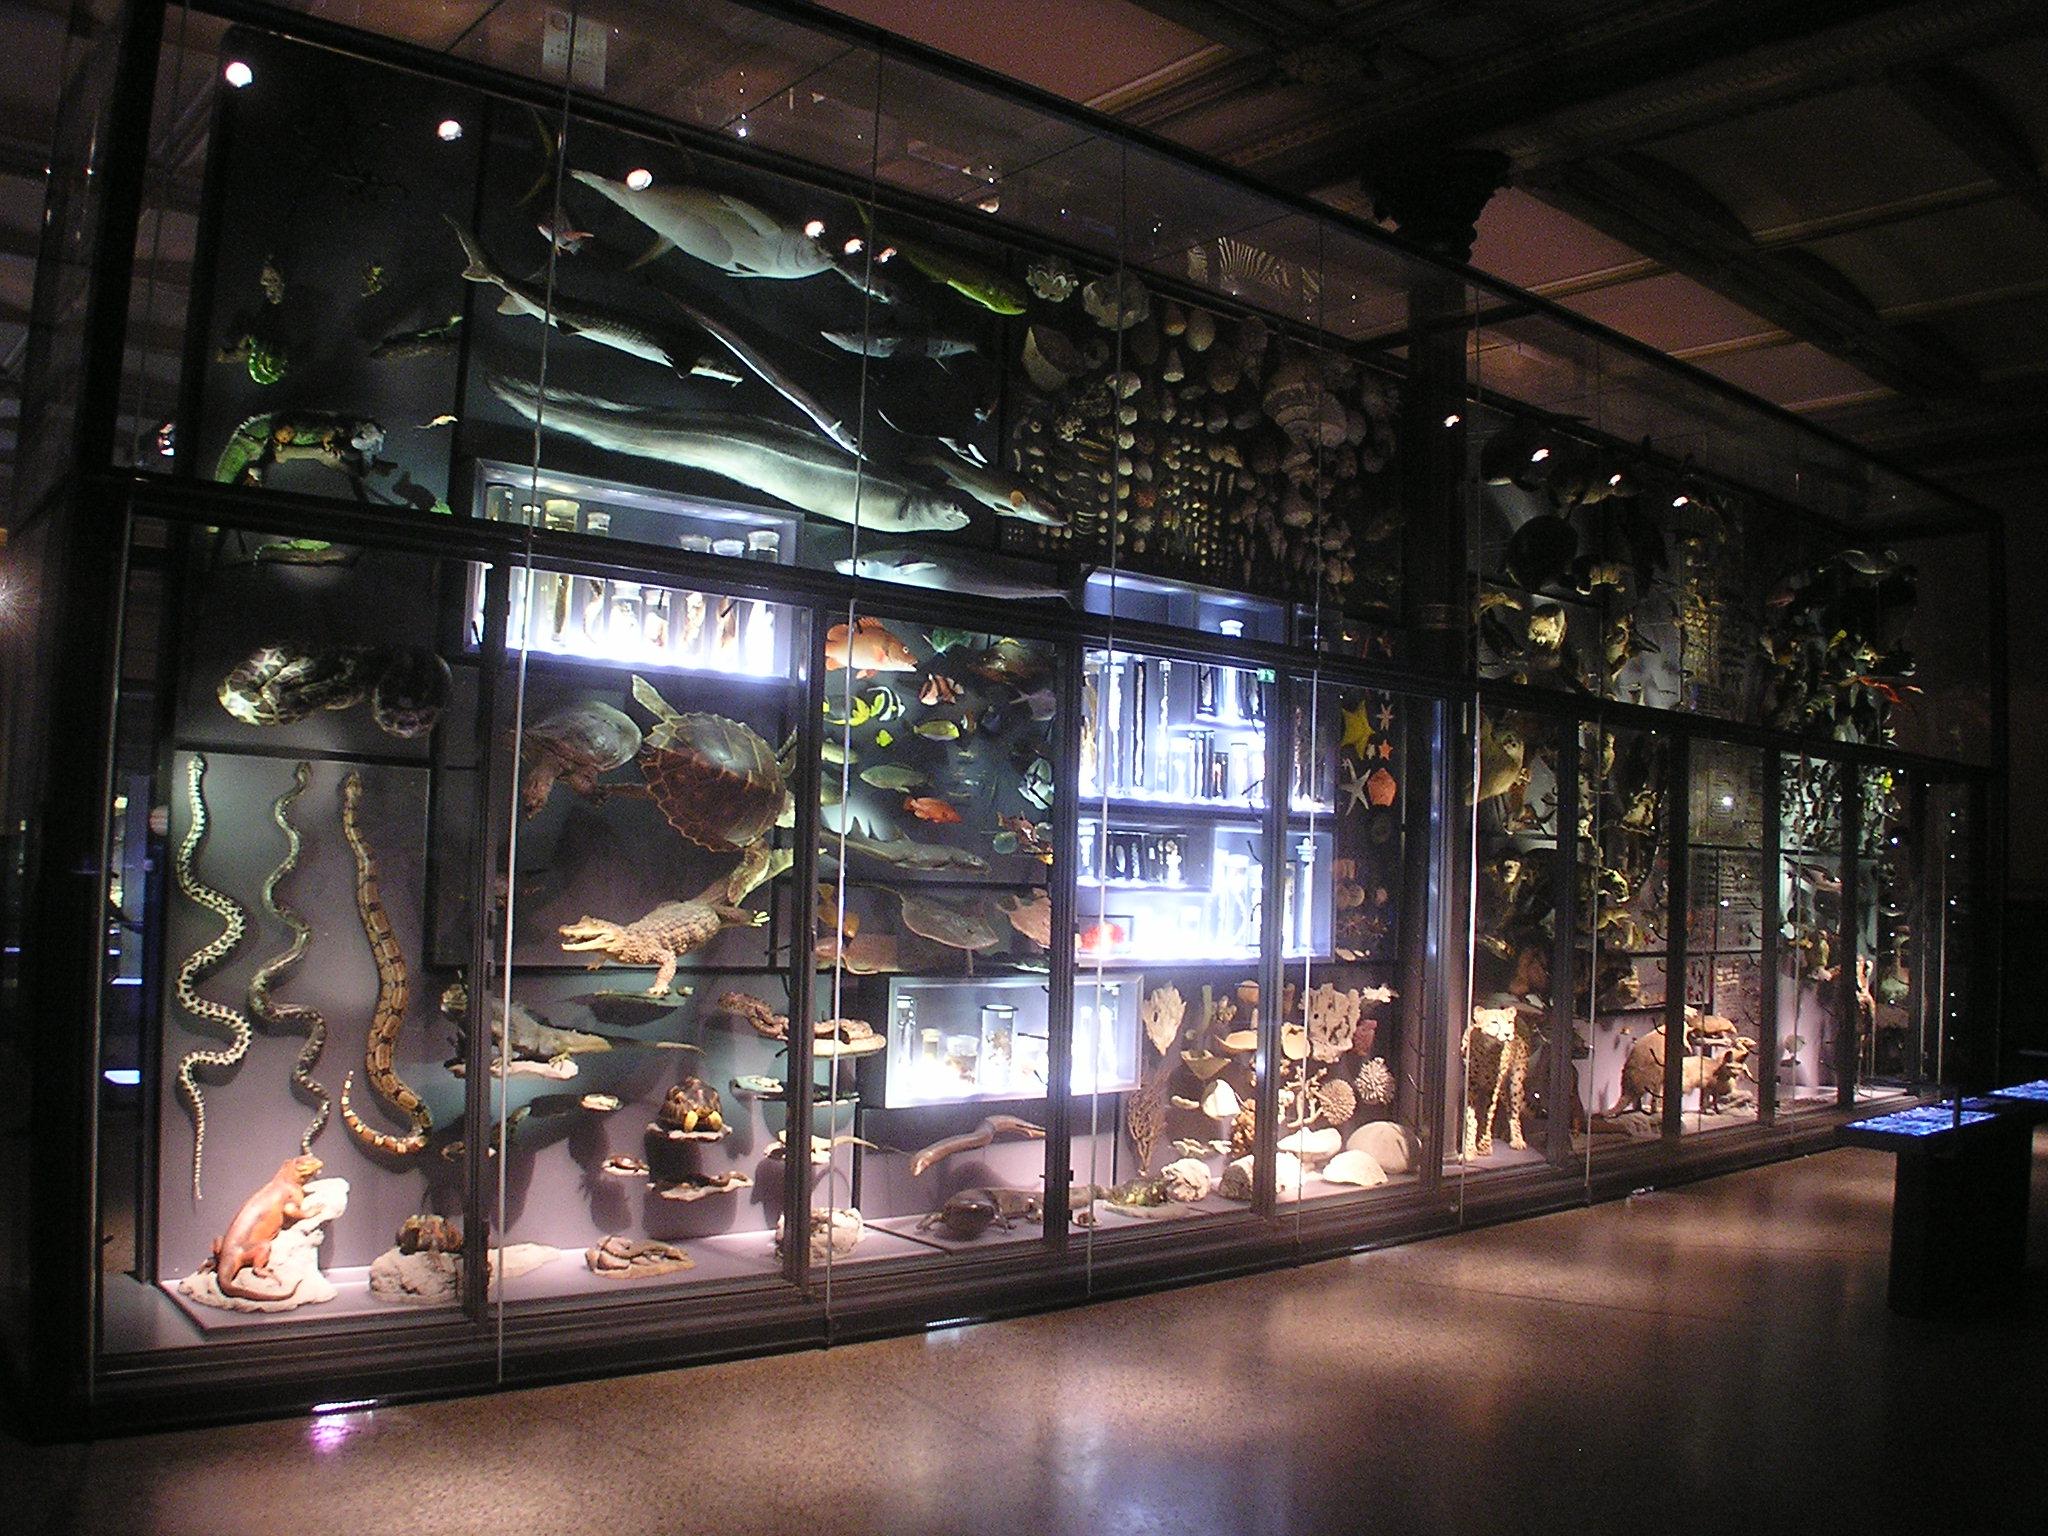 Preview image for LOM object Artenvielfalt und Lebensräume